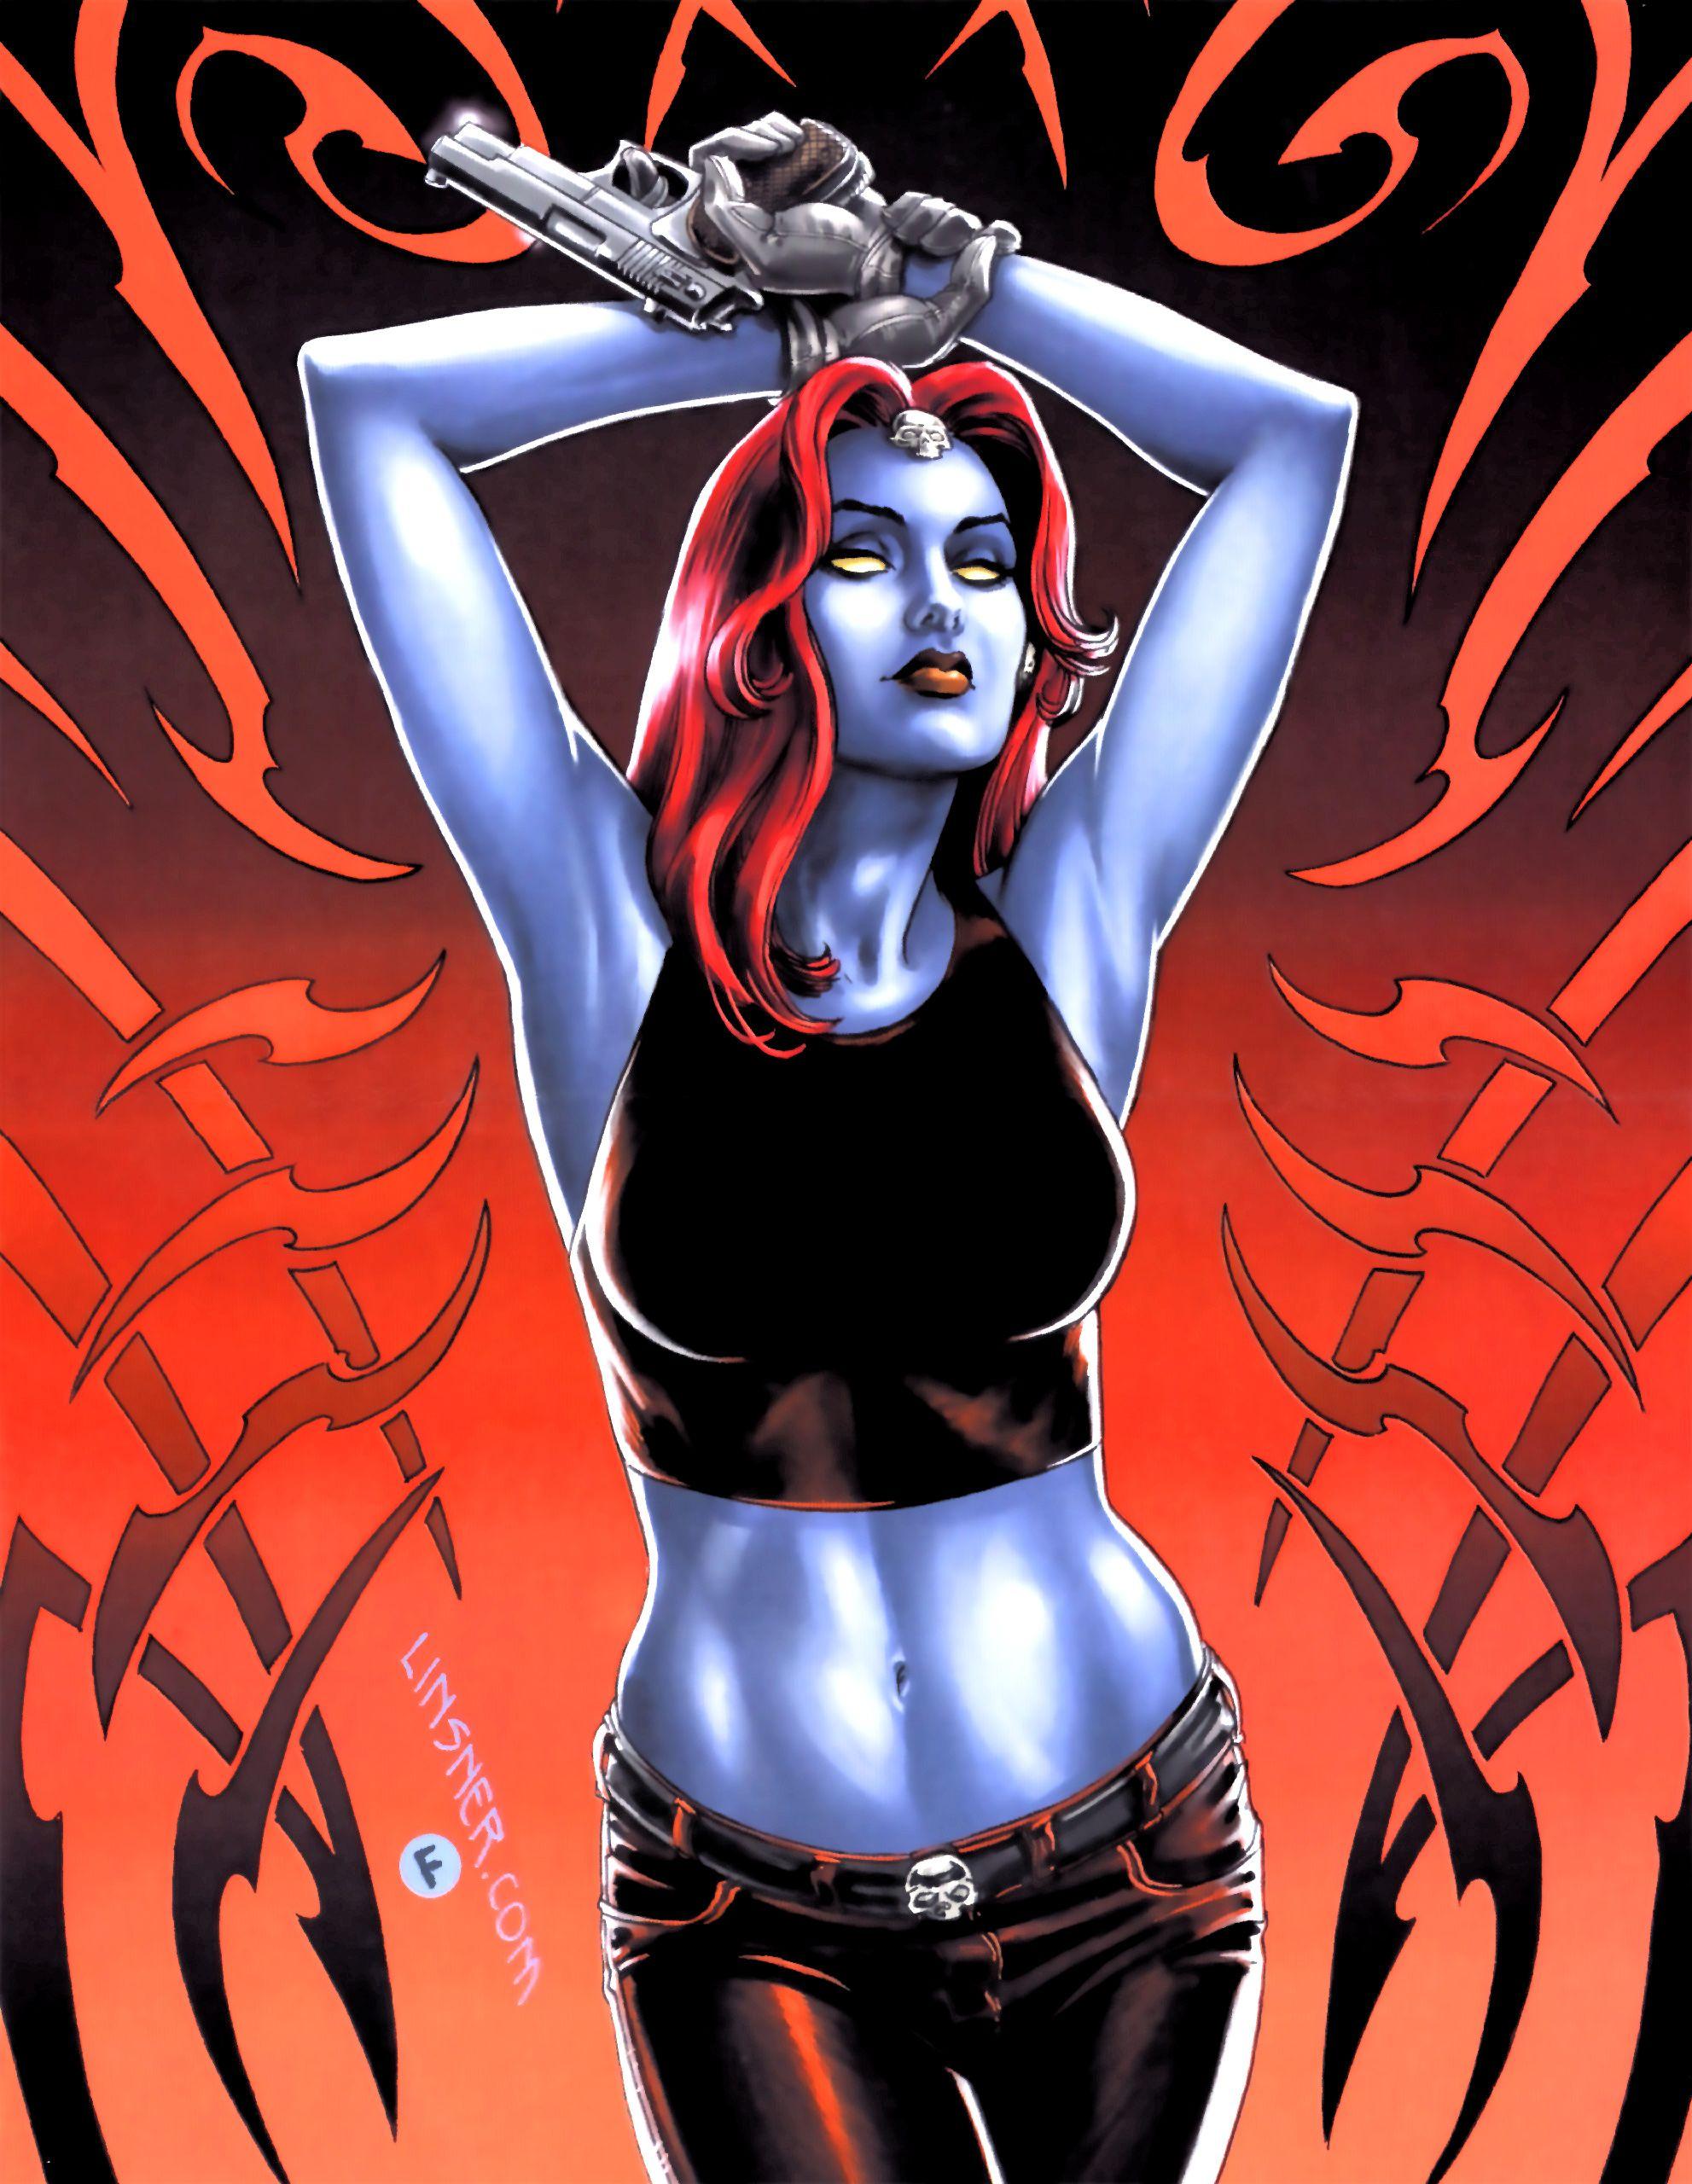 Erotic comic fiction x men mystique